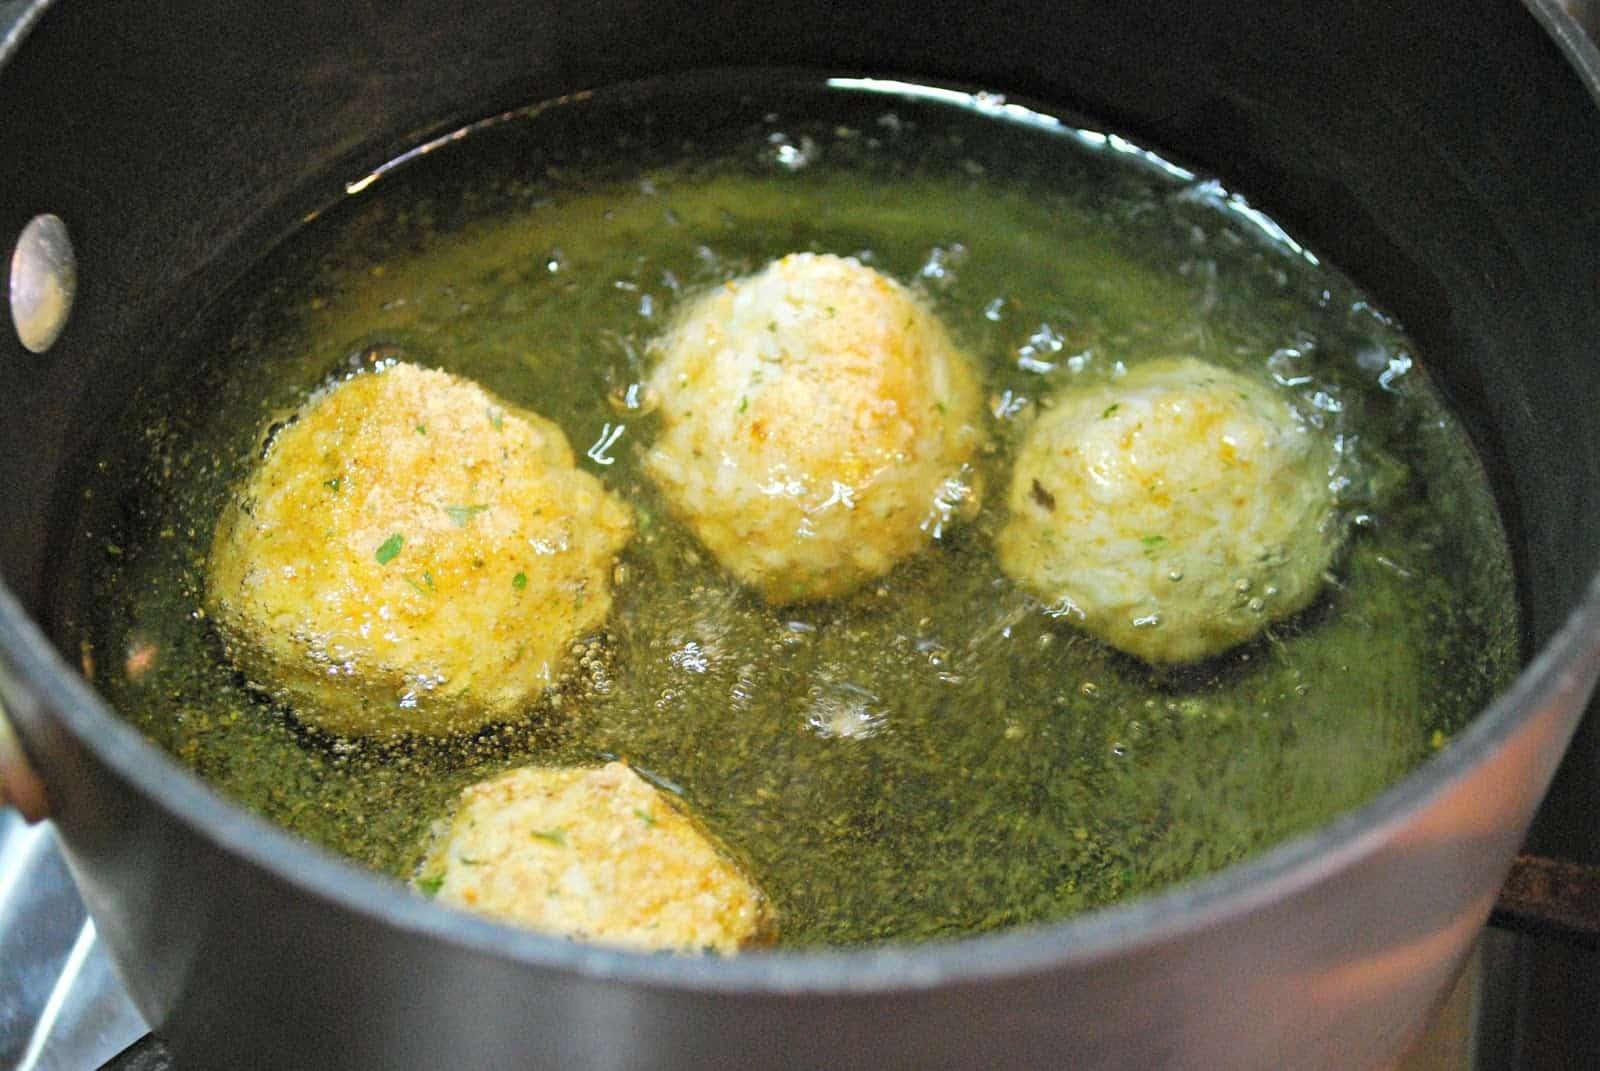 frying rice balls in oil